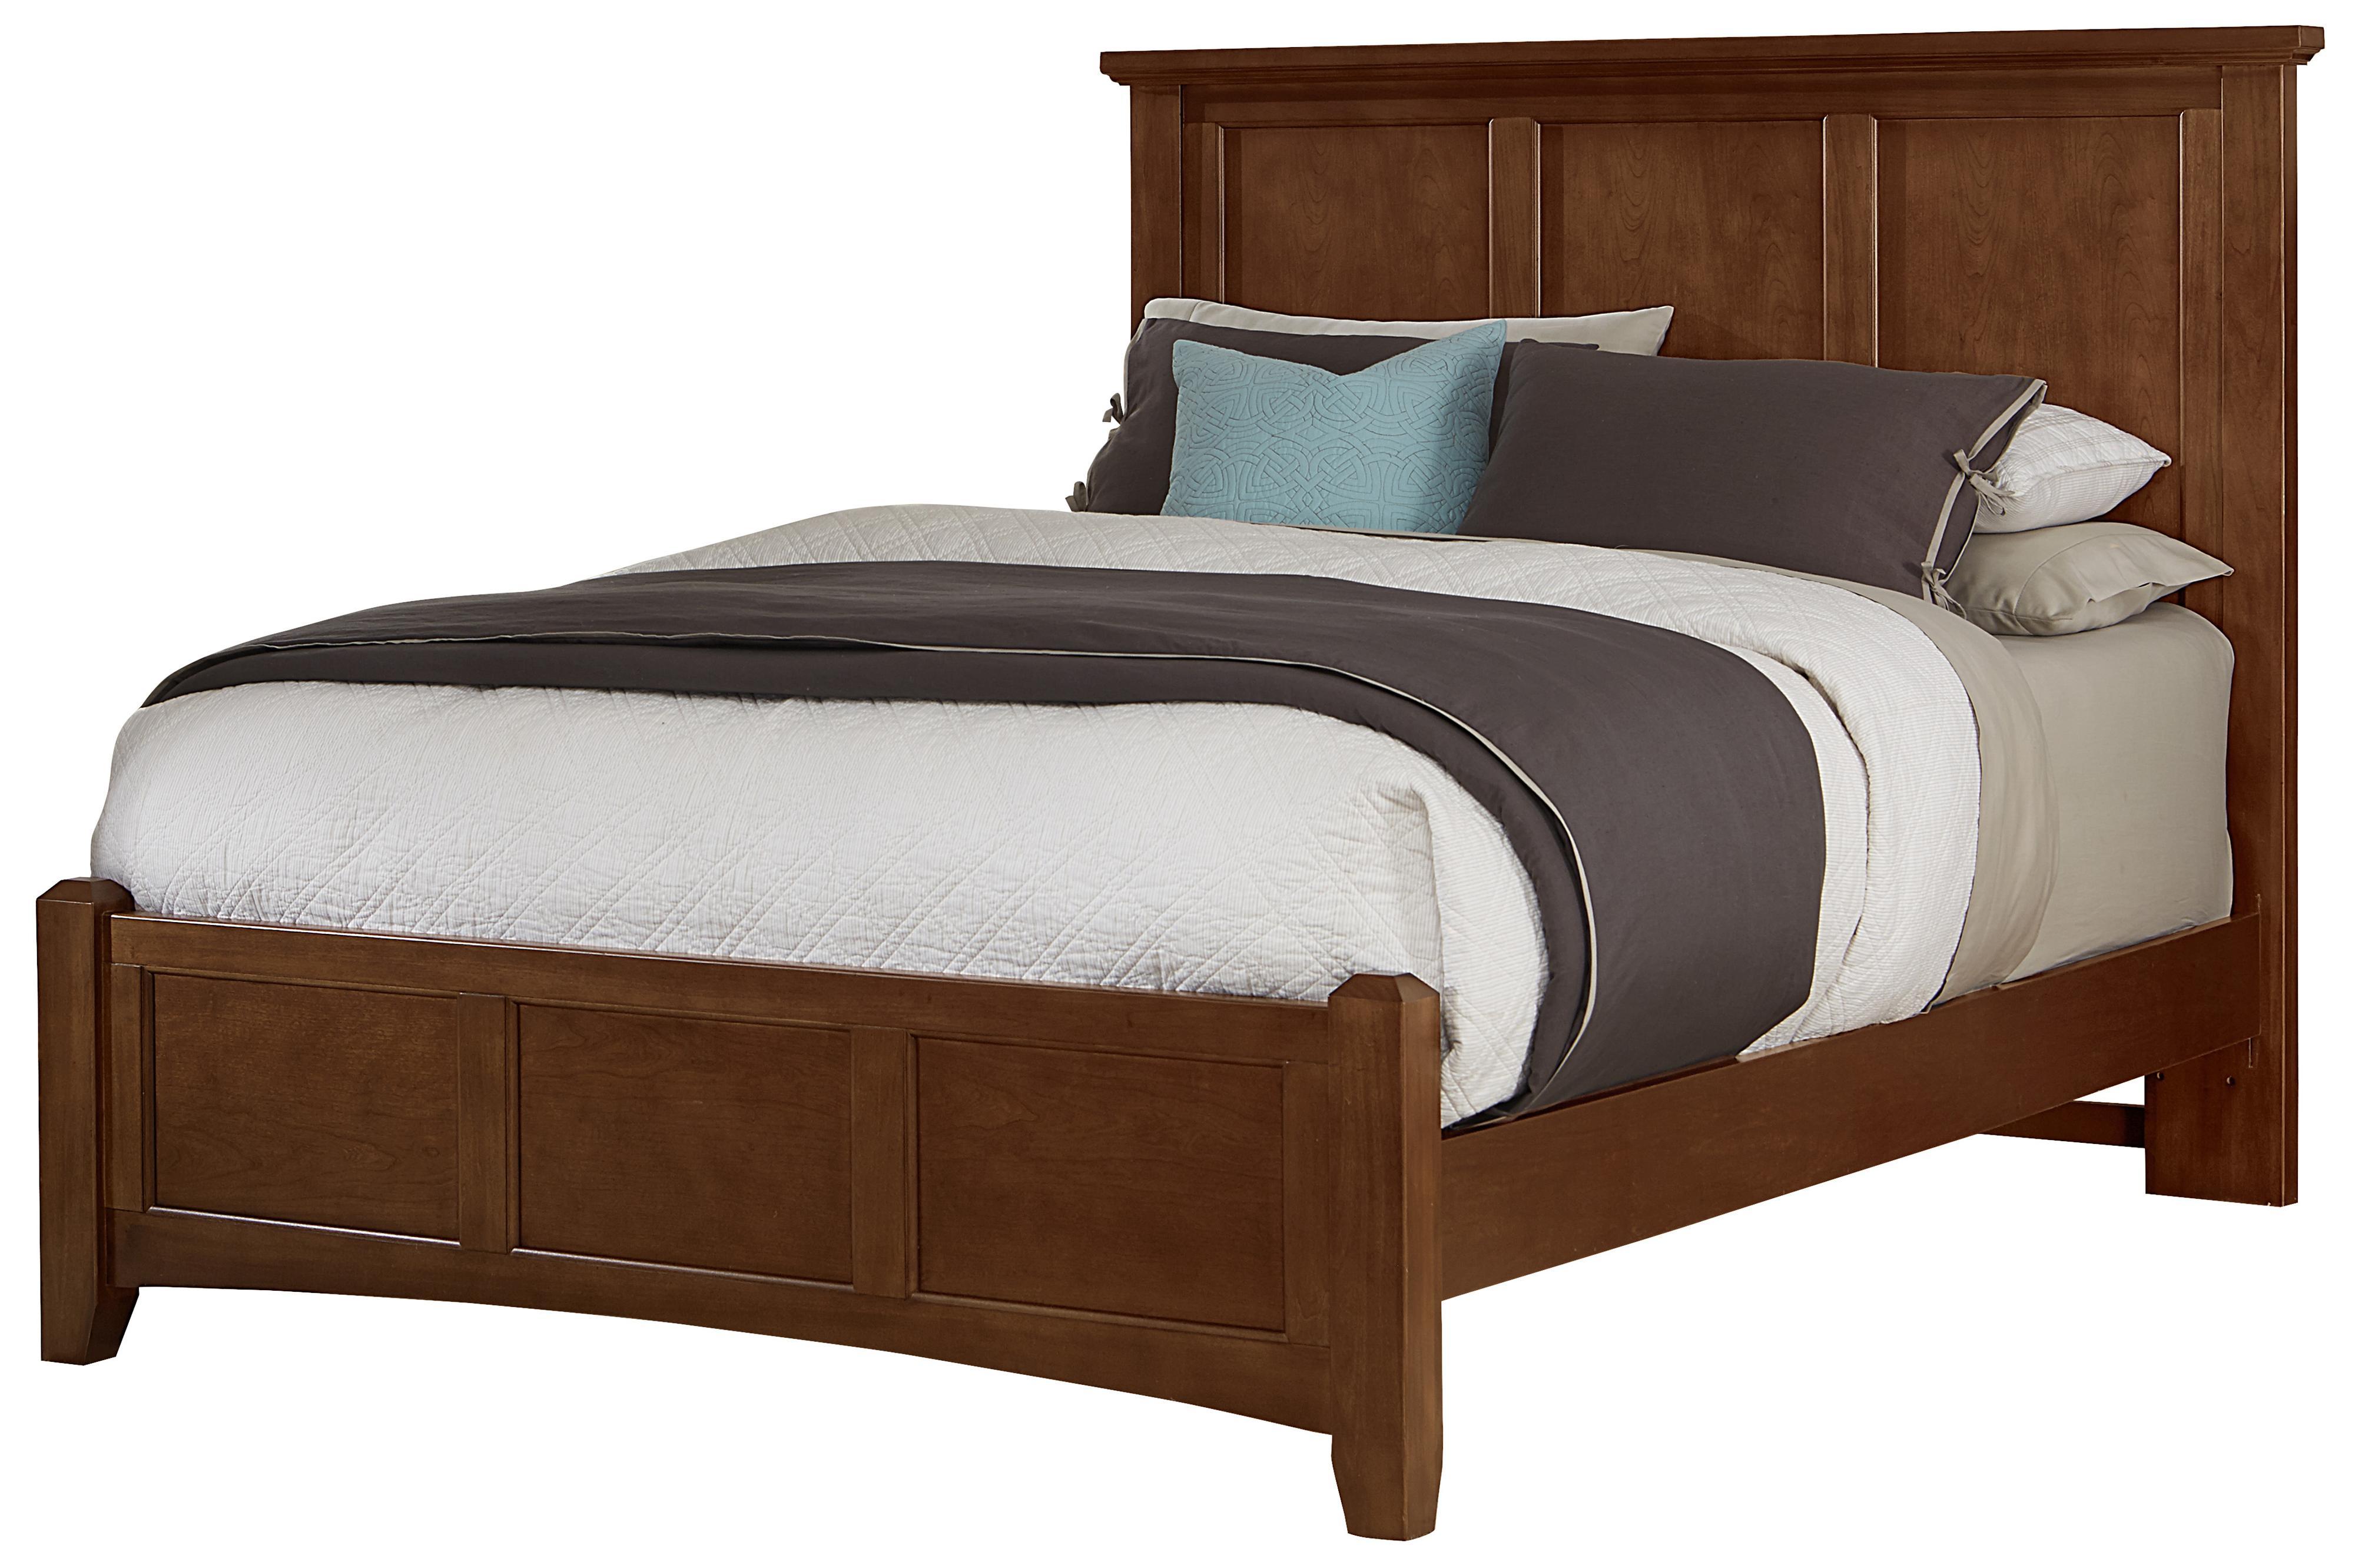 vaughan bassett bonanza king mansion bed with low profile footboard belfort furniture panel beds. Black Bedroom Furniture Sets. Home Design Ideas